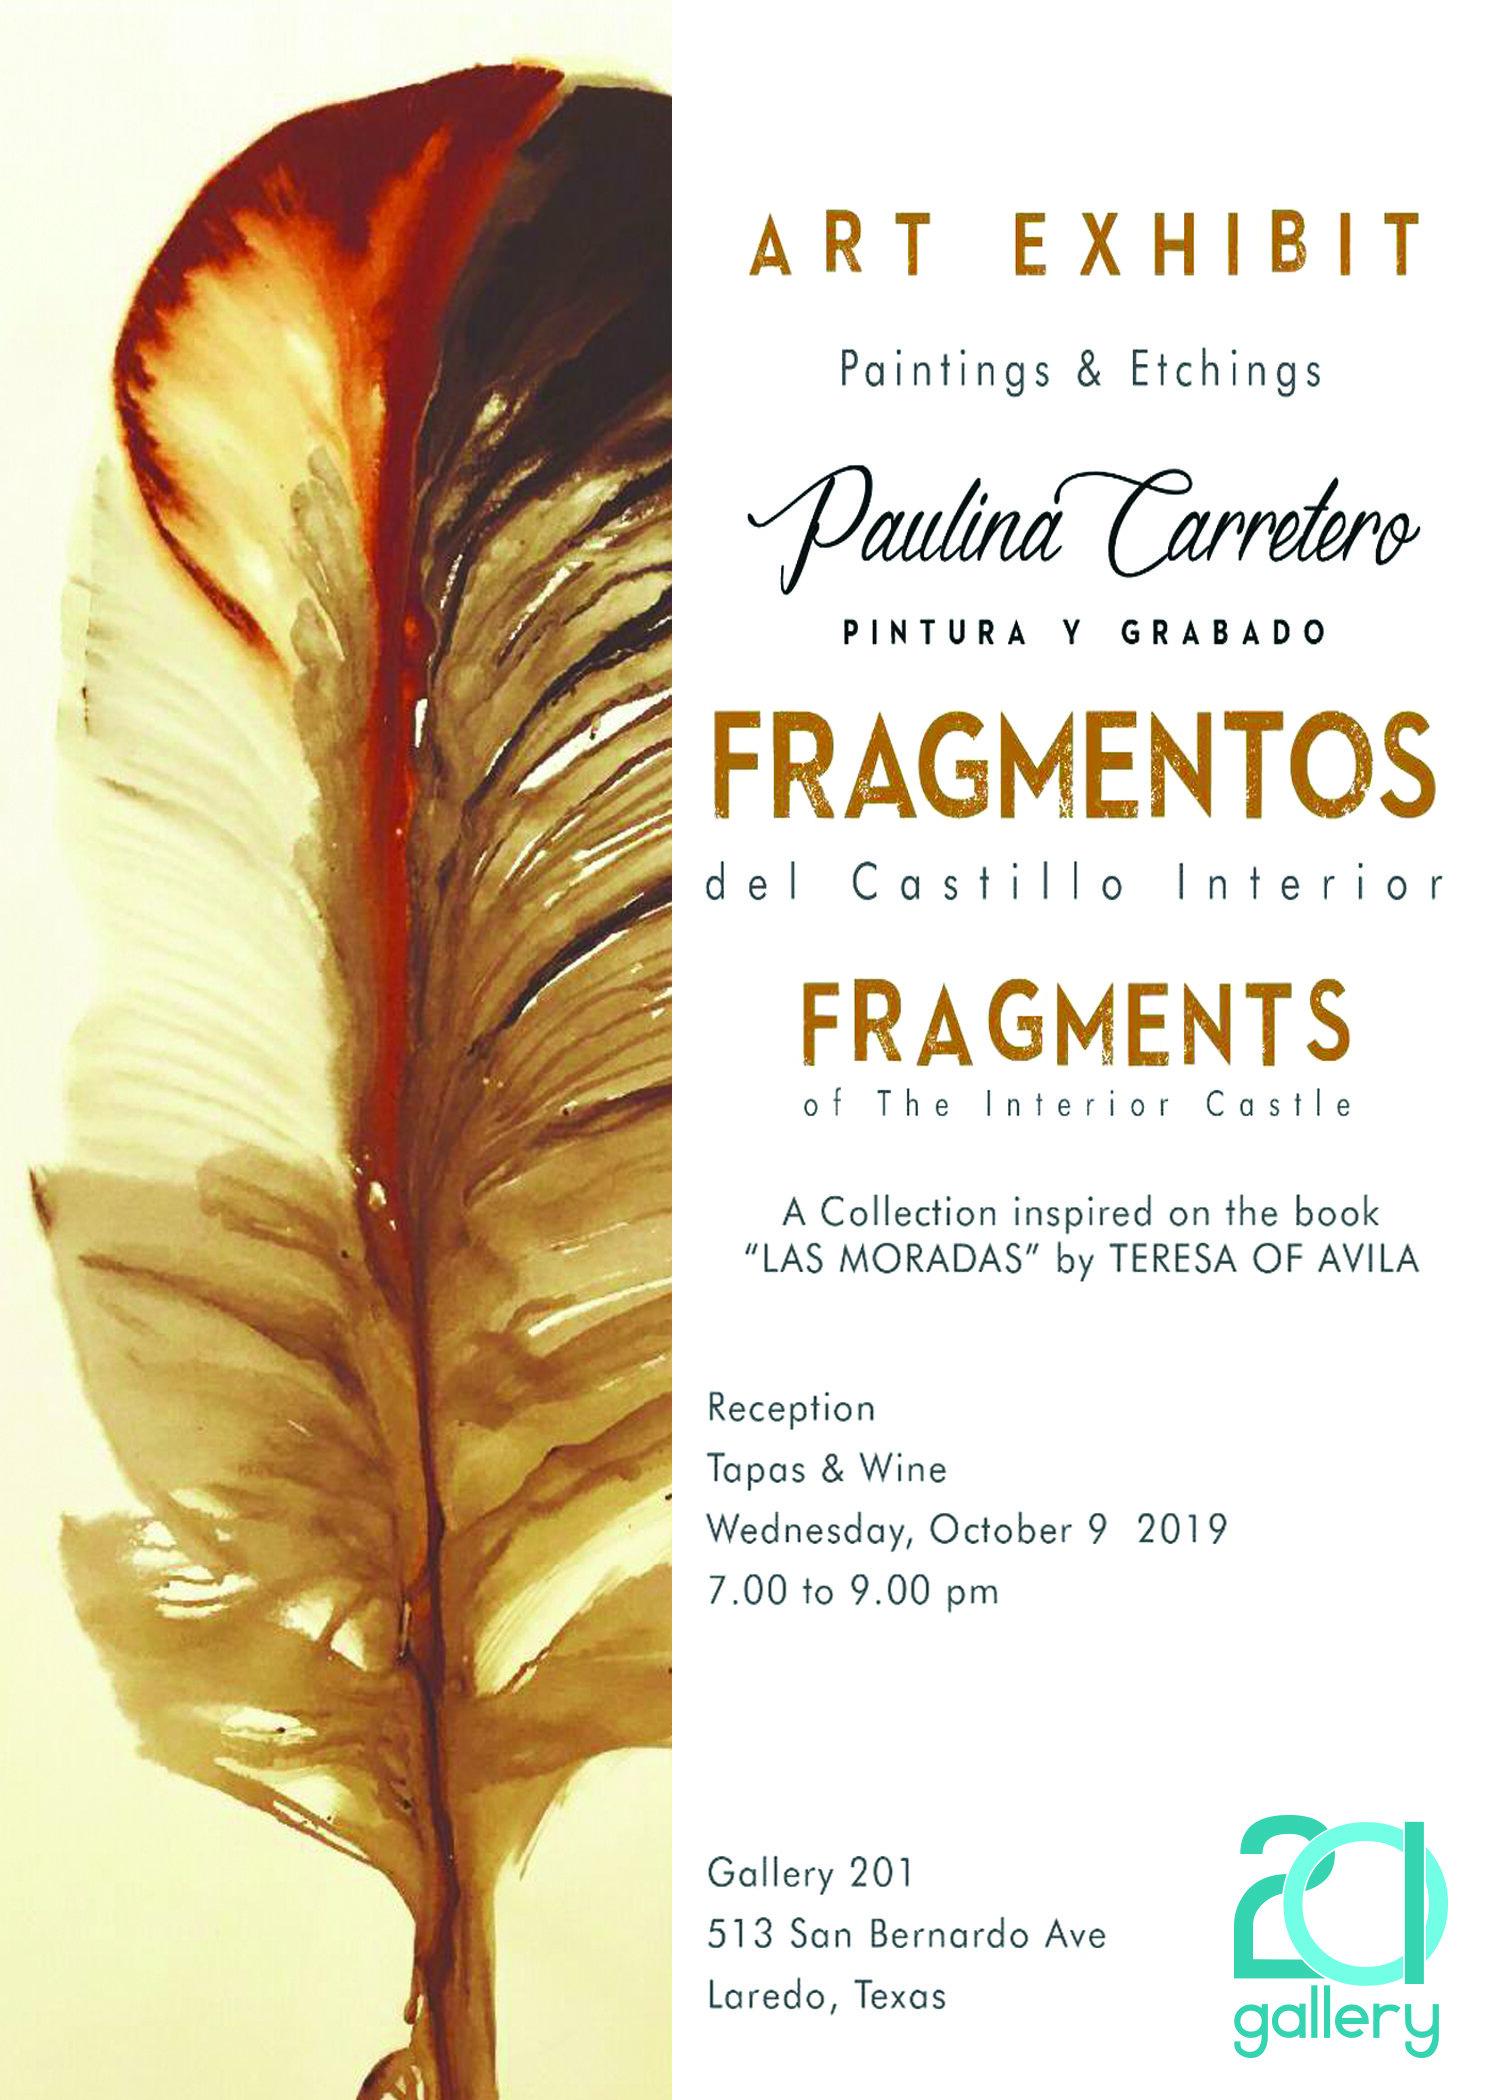 Fragmentos - Gallery 201 - 5 x 7 Invitation.jpg